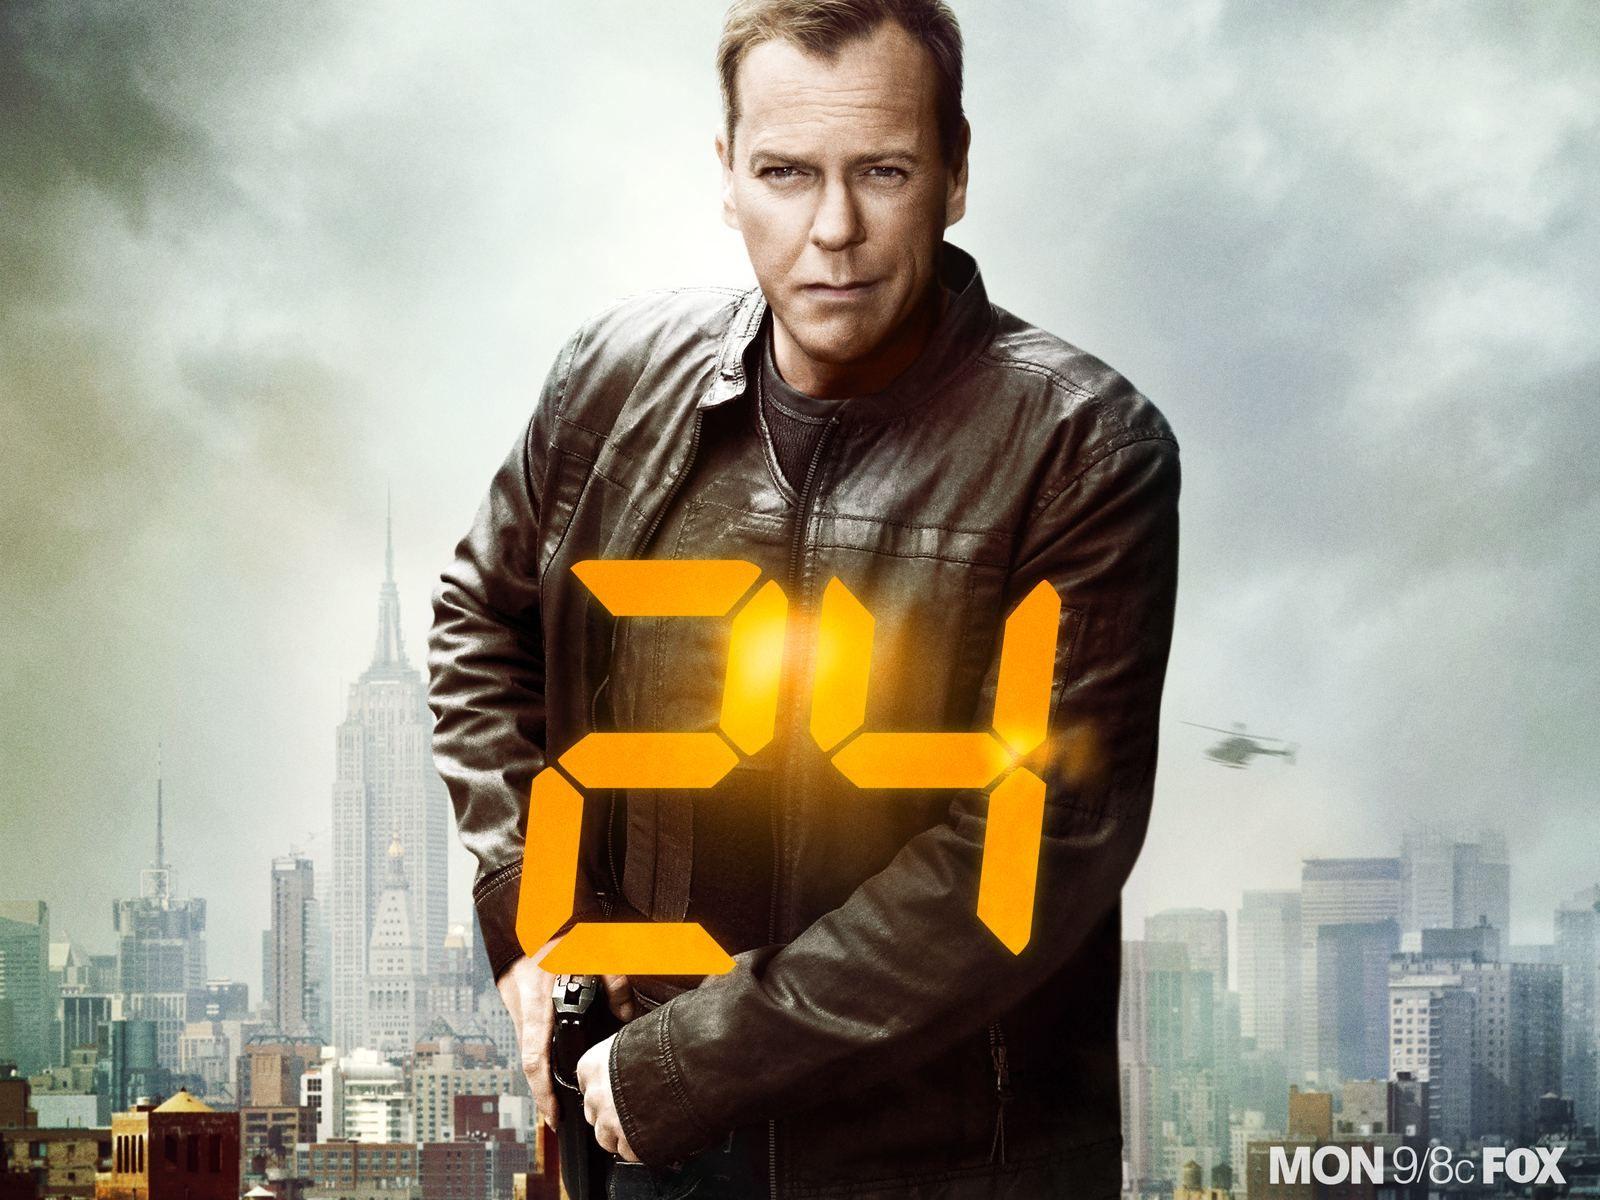 24 Season 8 TV Series Movie Photos and Wallpapers   Free Desktops Download